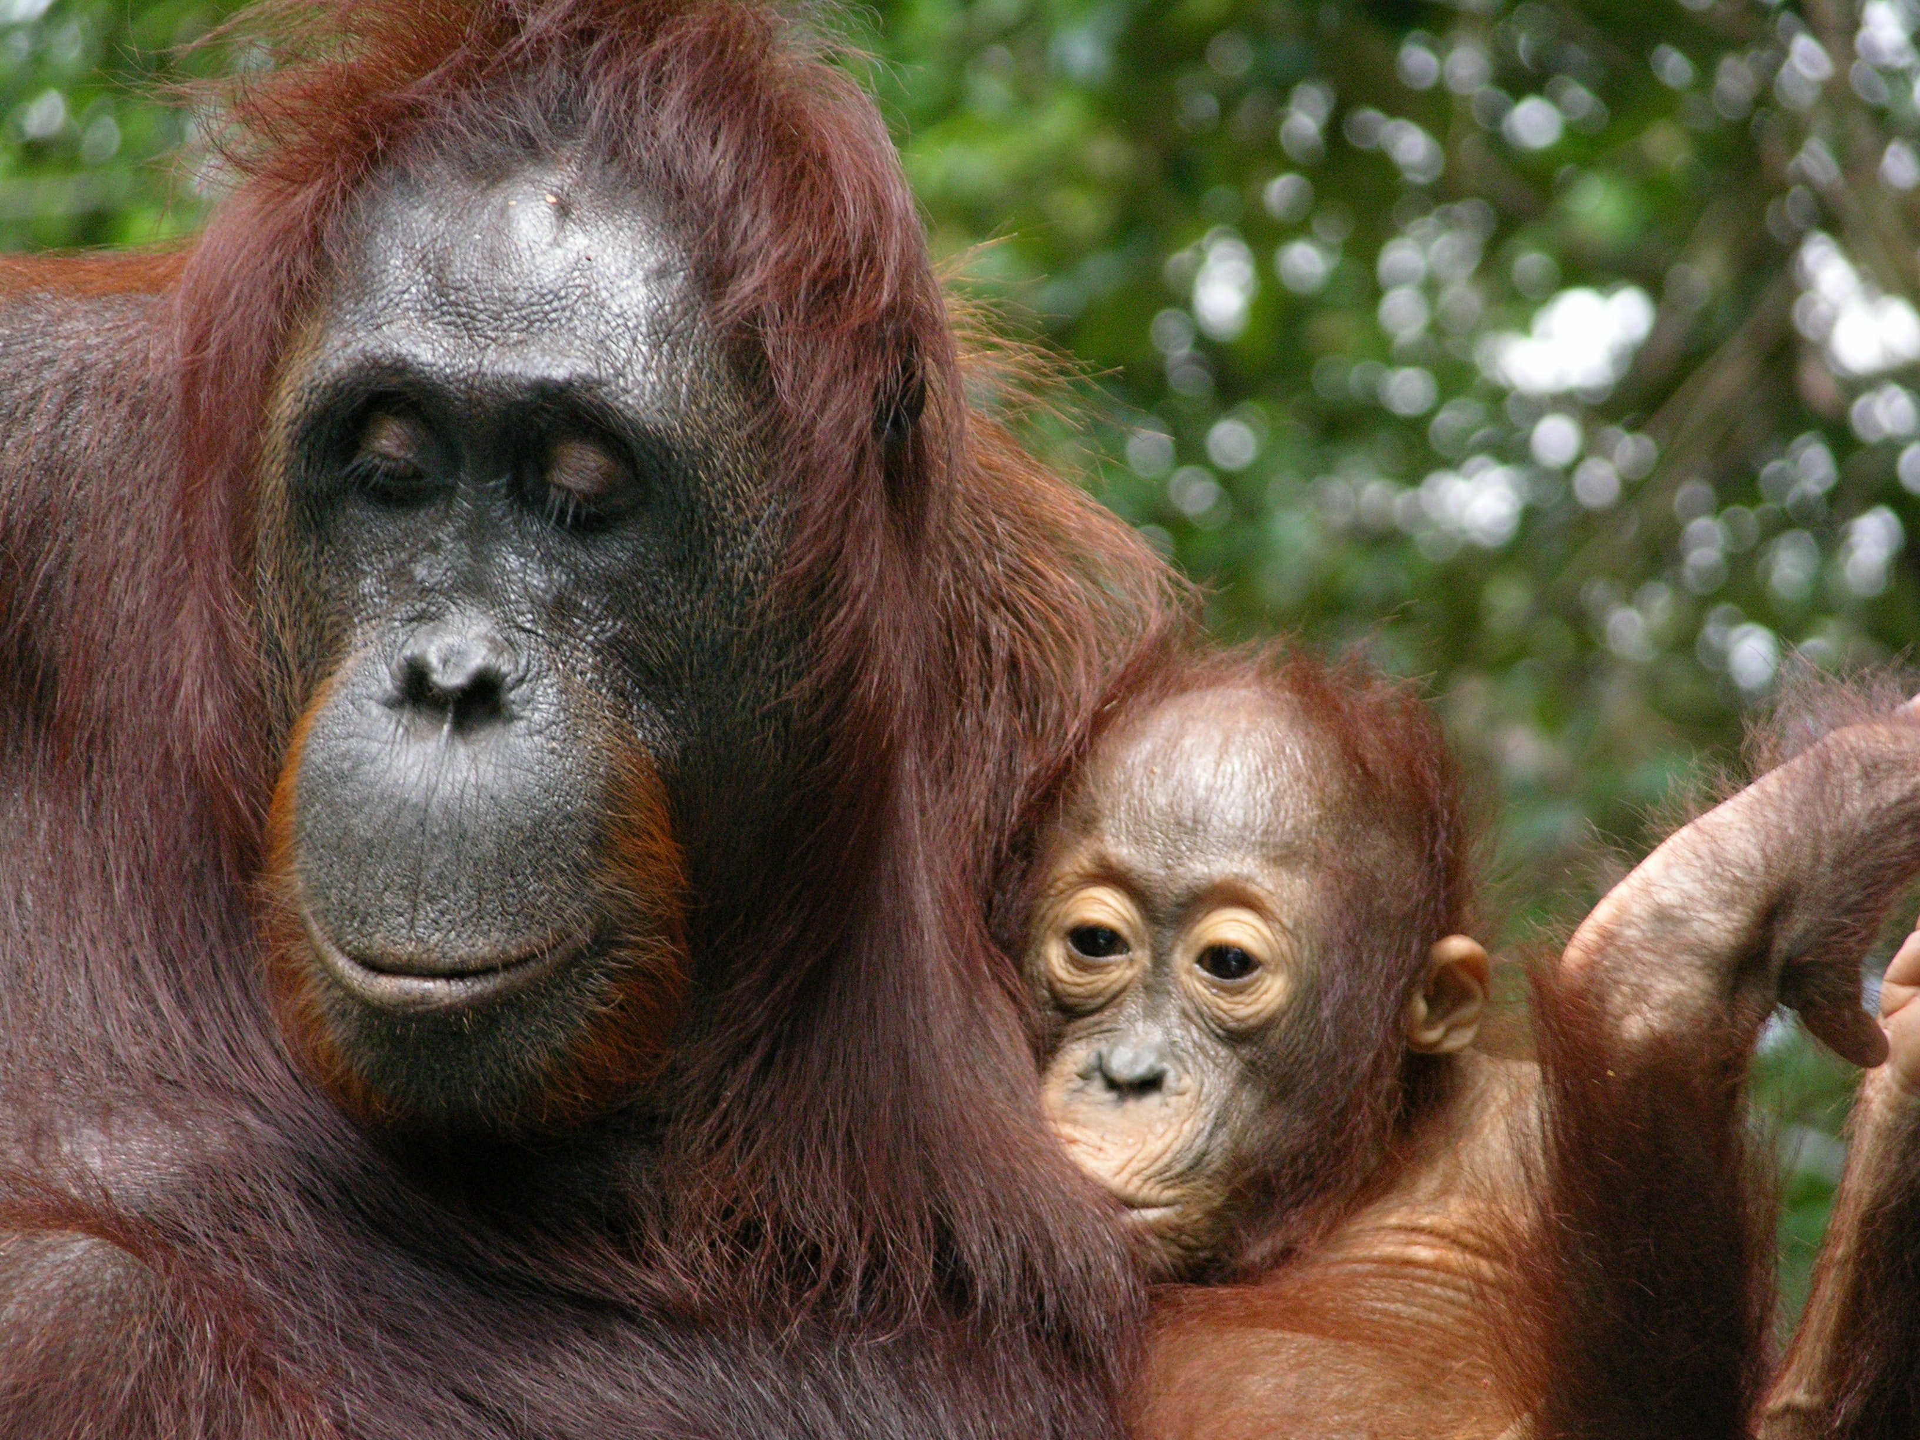 Image of: Orang Utan The Conversation The Lengthy Childhood Of Endangered Orangutans Is Written In Their Teeth